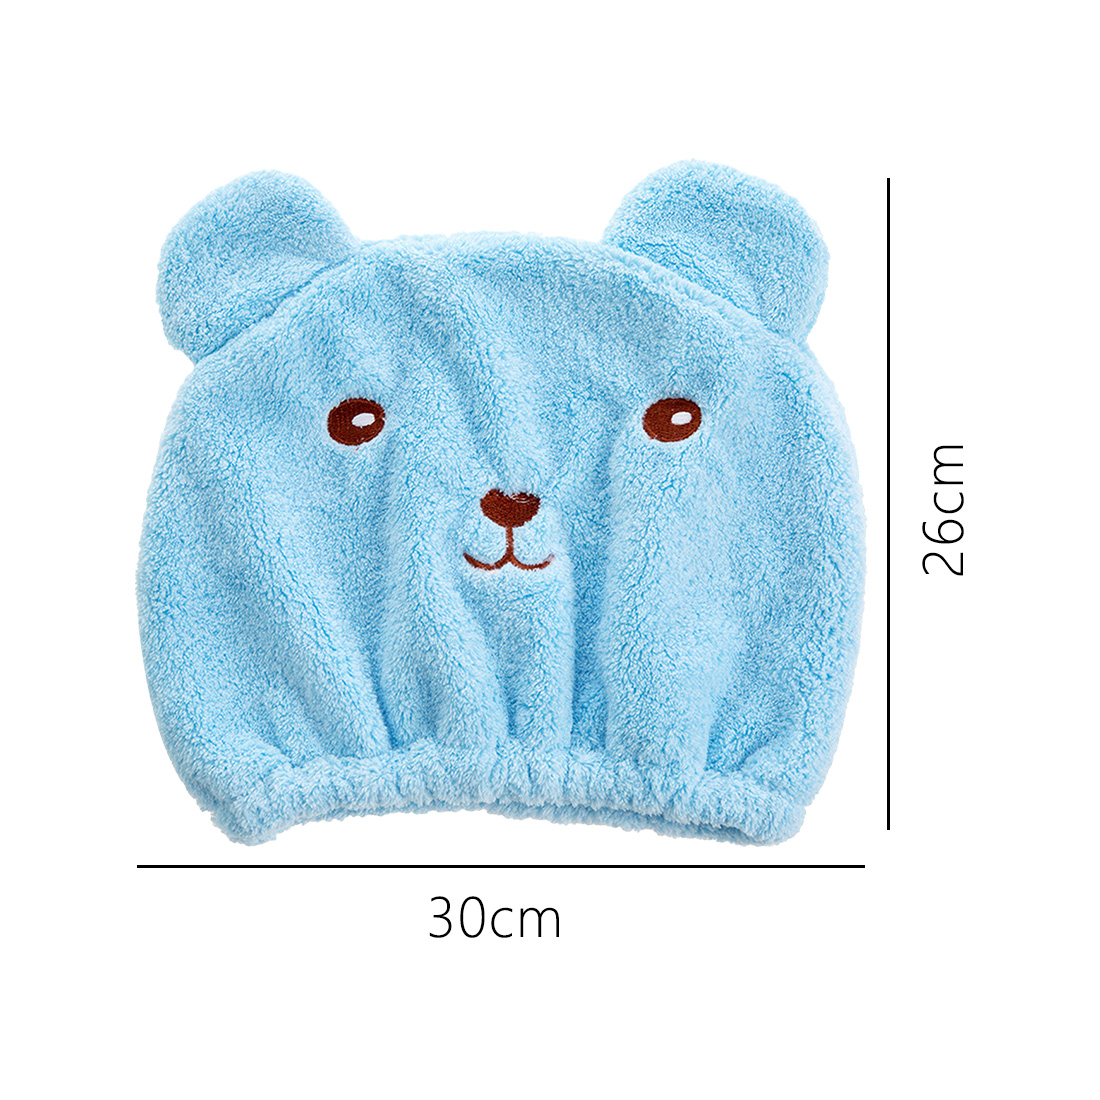 Bath Accessories Cute Bear Shower Cap For Hair Wrapped Towels Microfiber Shower Hats Bath Caps Superfine Quickly Dry Hair Cap